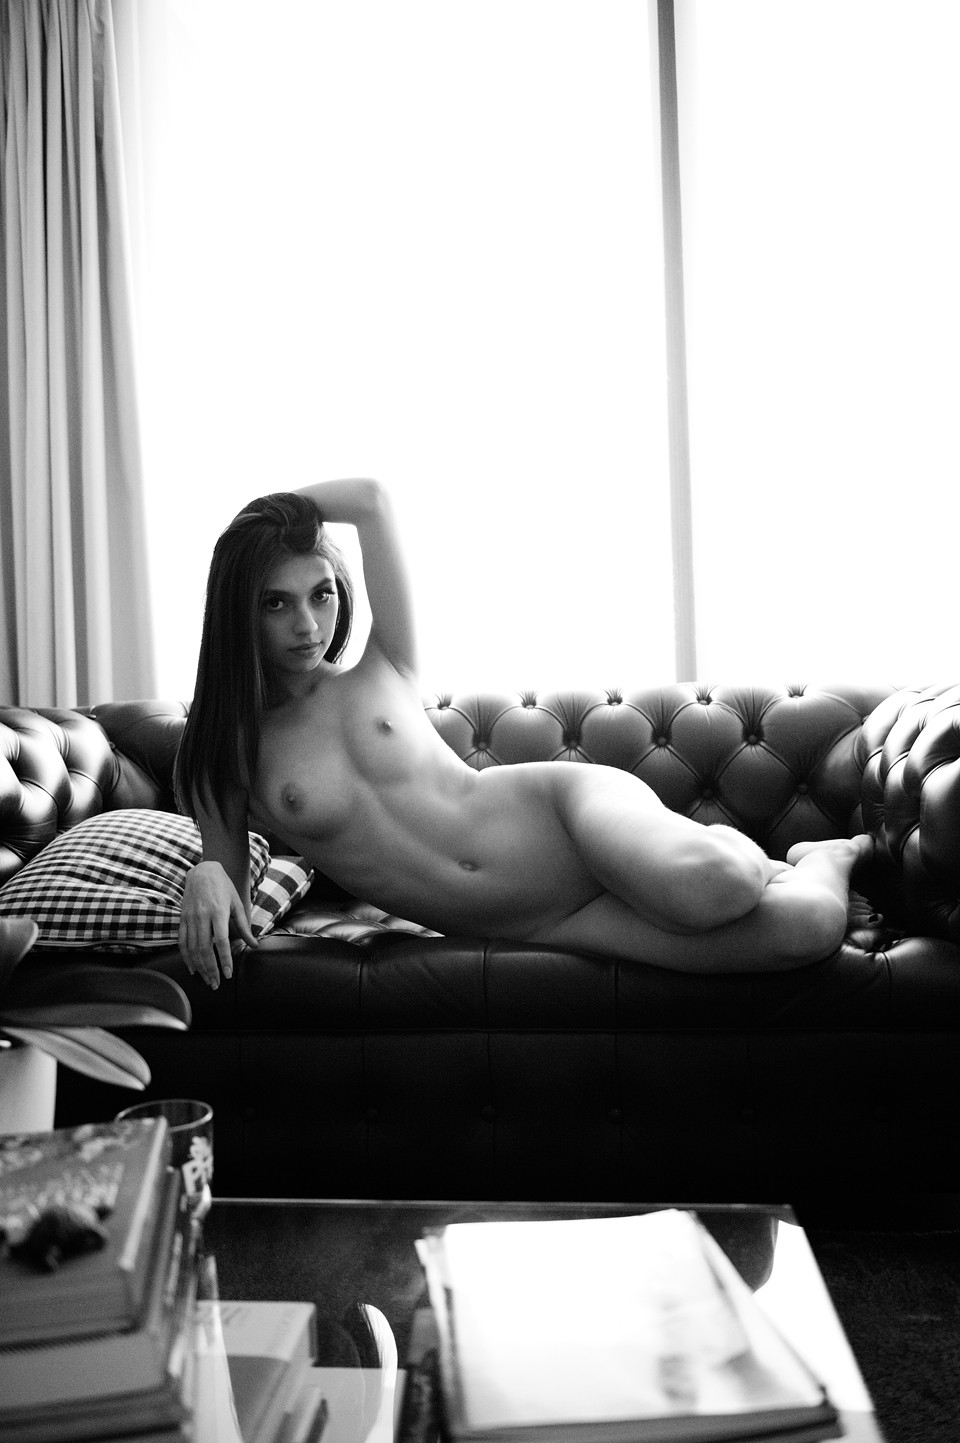 Iris Abella